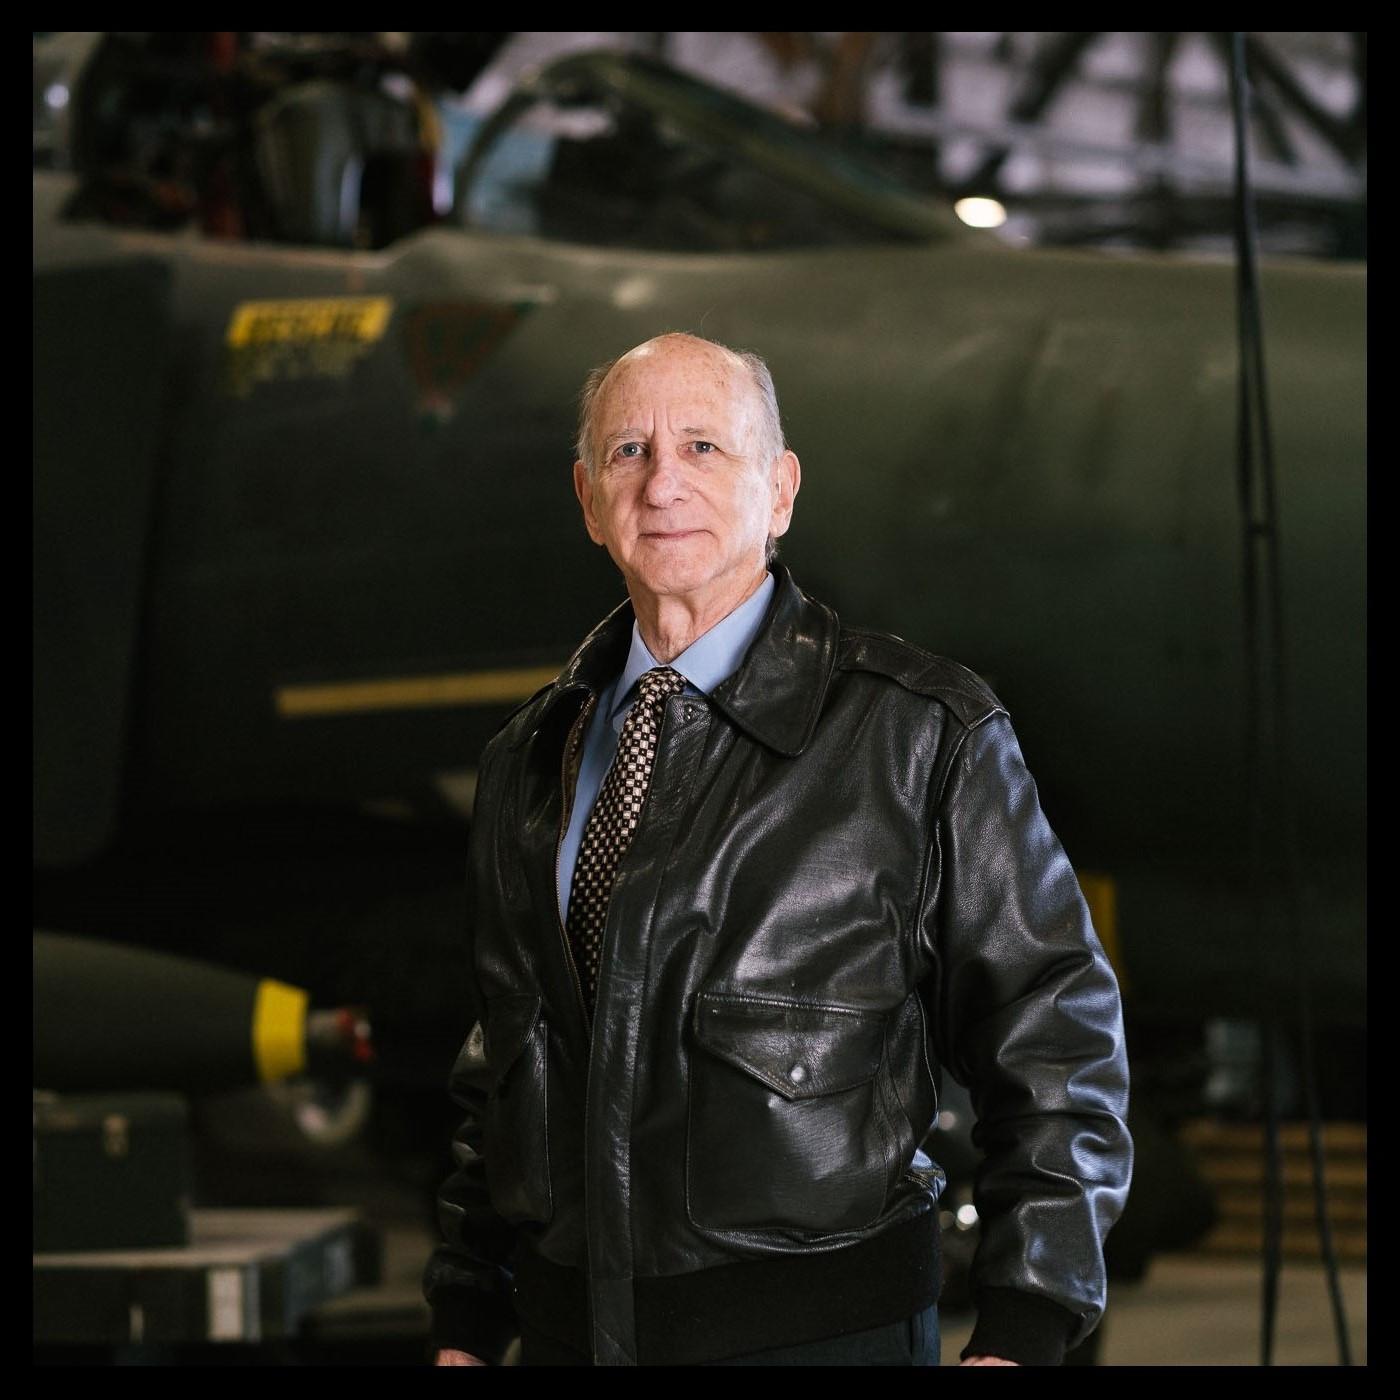 George Nolly, USAF Vietnam War Veteran, Author